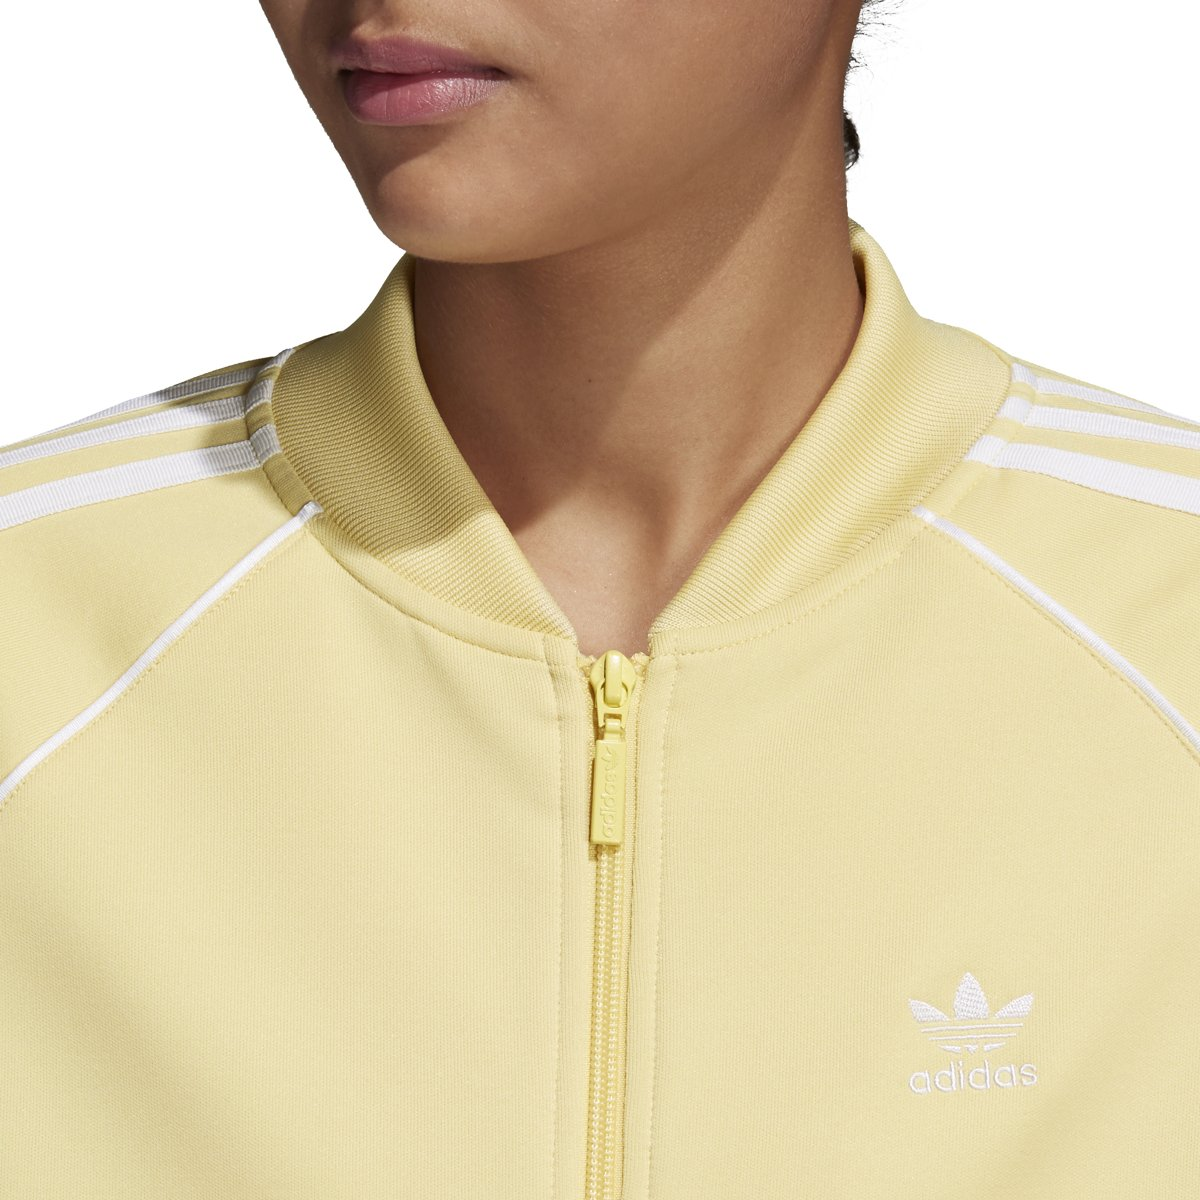 adidas Originals Women's SST Track Jacket Sand X-Small